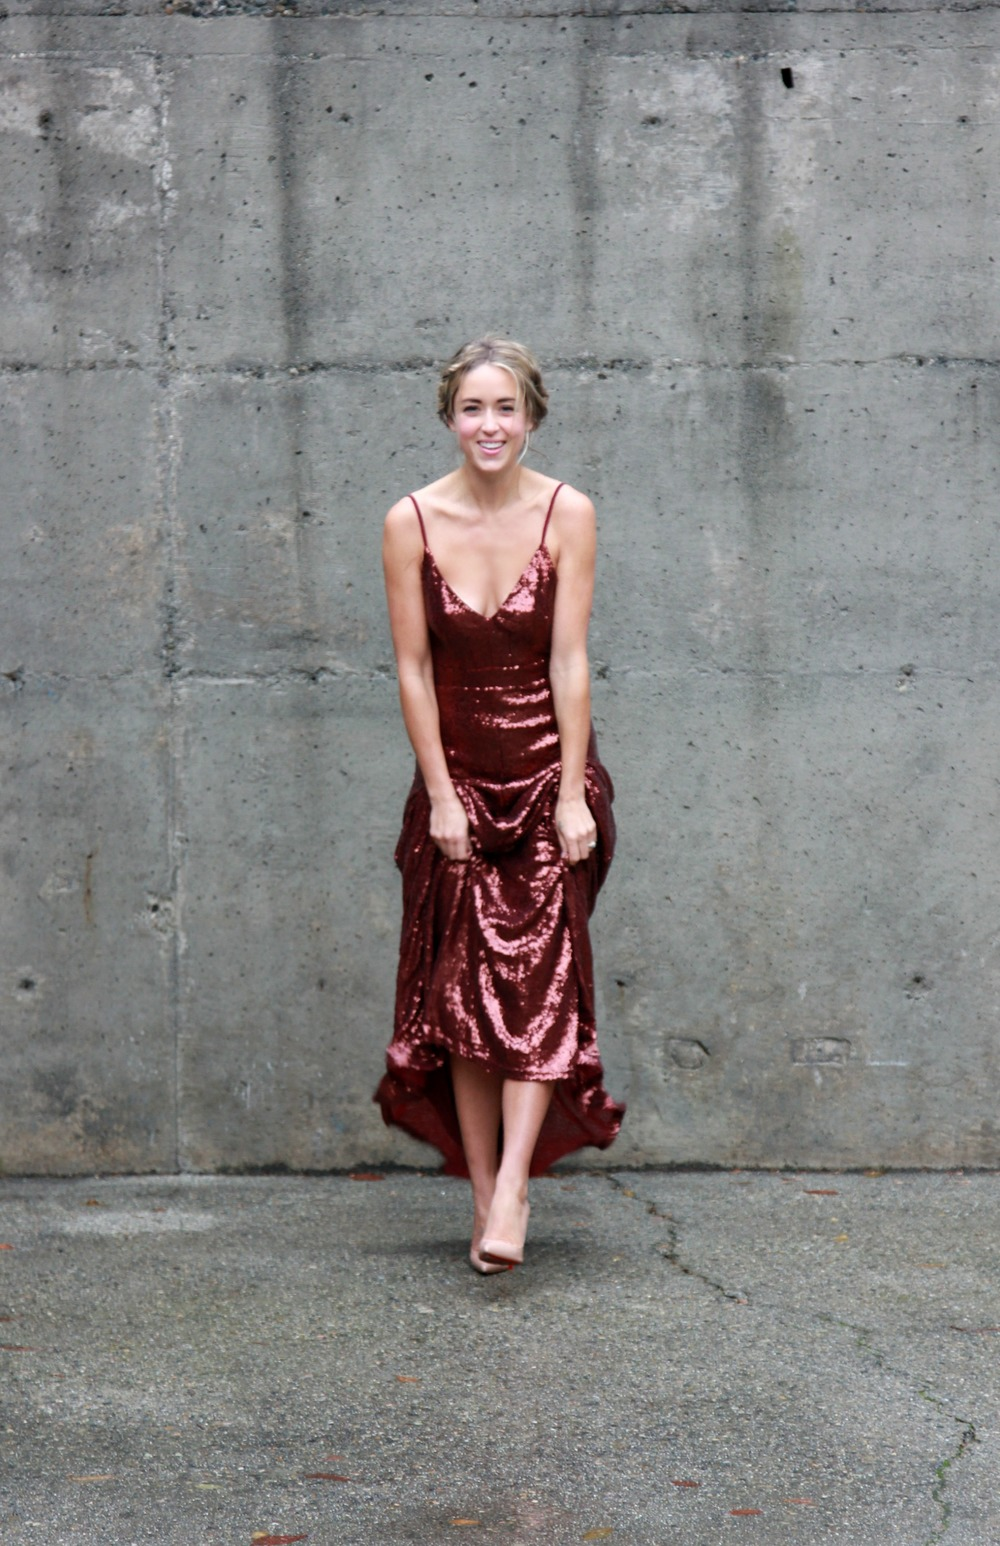 Lulu's Maxi Dress, Christian Louboutin Heels